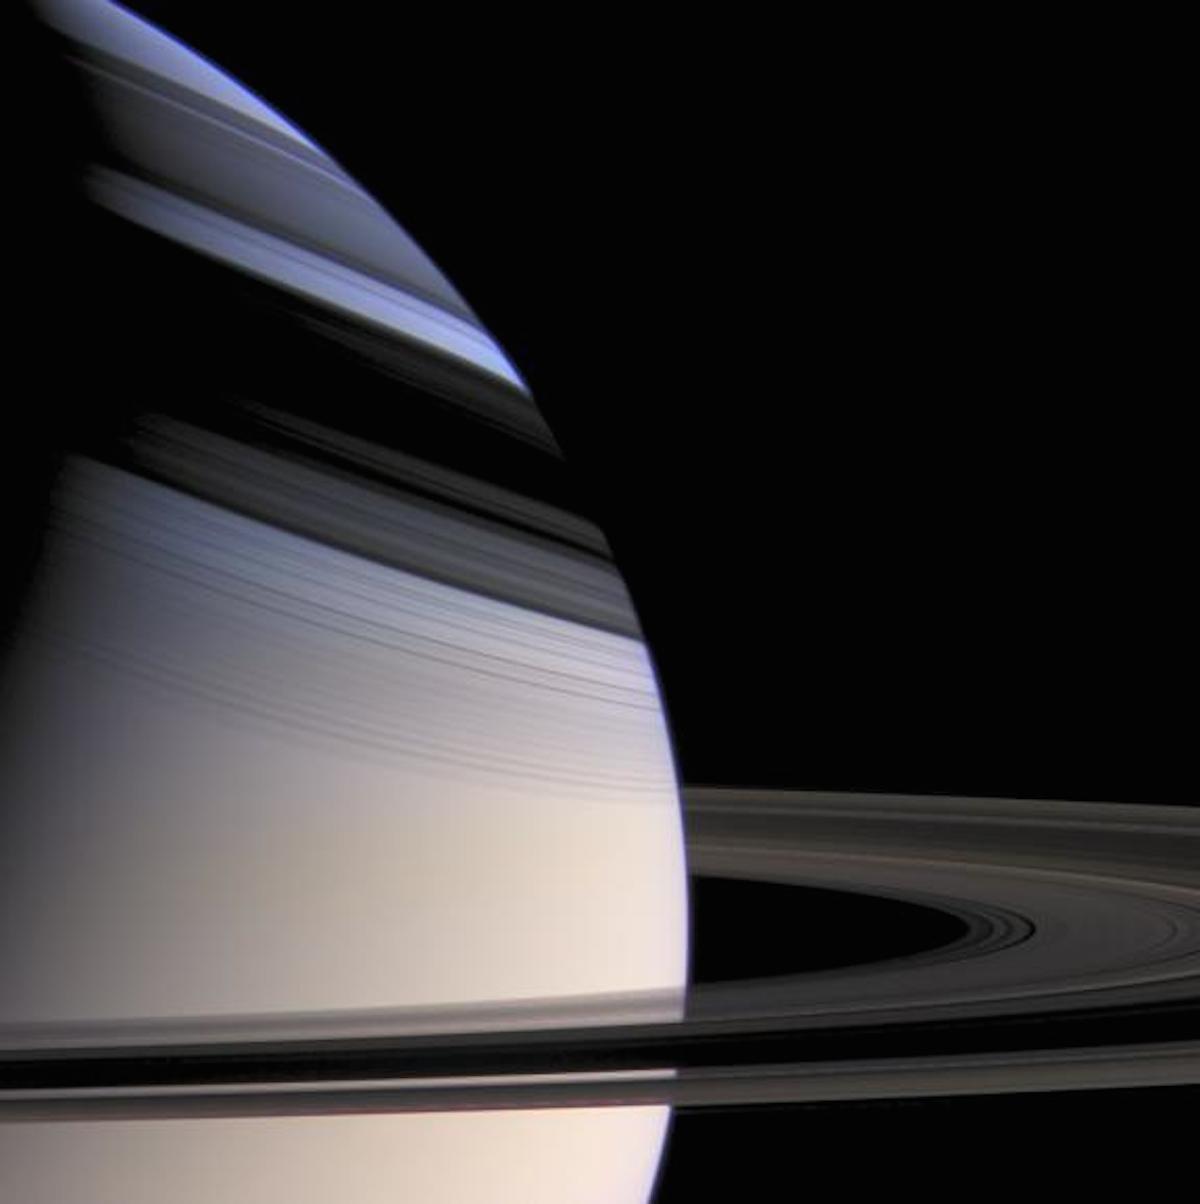 imagenes nunca vistas de saturno tomadas por la sonda cassini 17